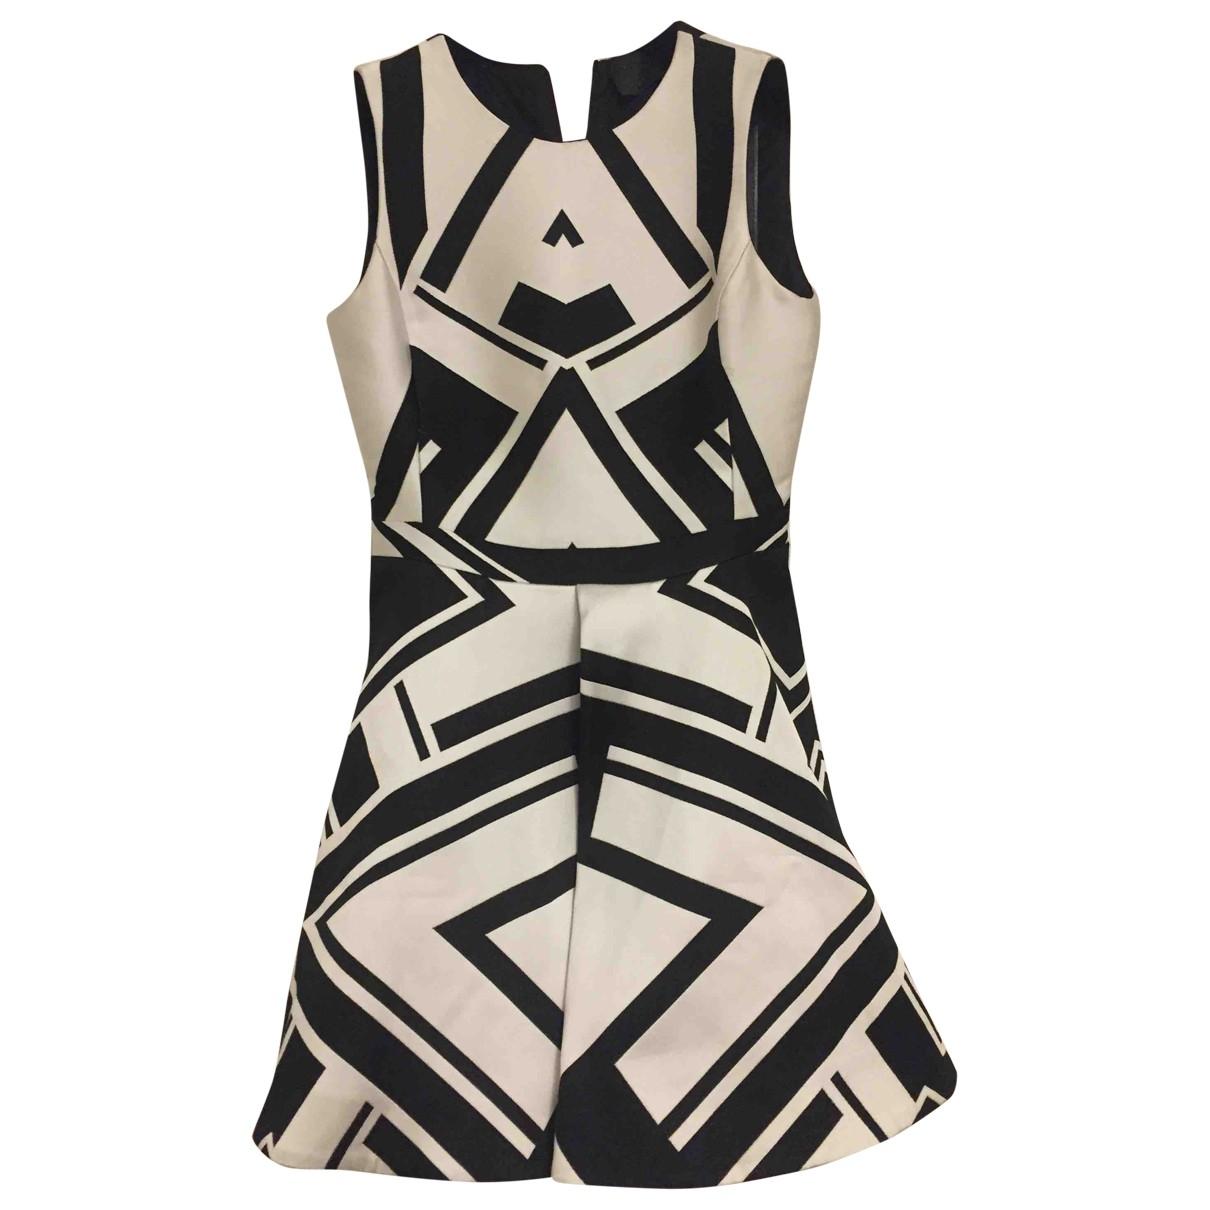 Philipp Plein \N dress for Women S International